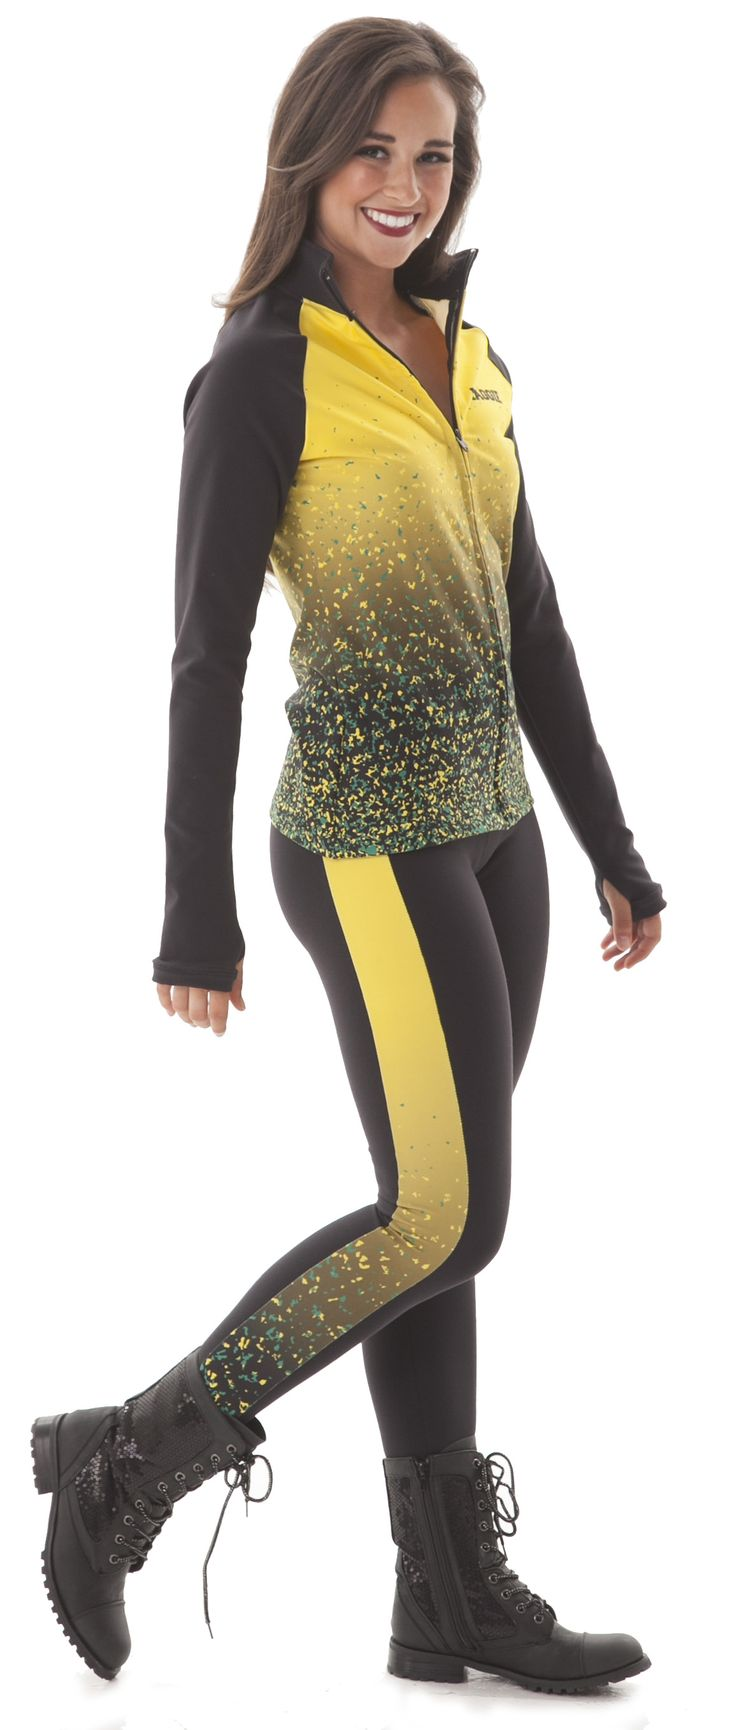 Custom Warm Ups! Ashwaubenon 2015-2016 dance team Warm Ups, leggings and ombre jacket